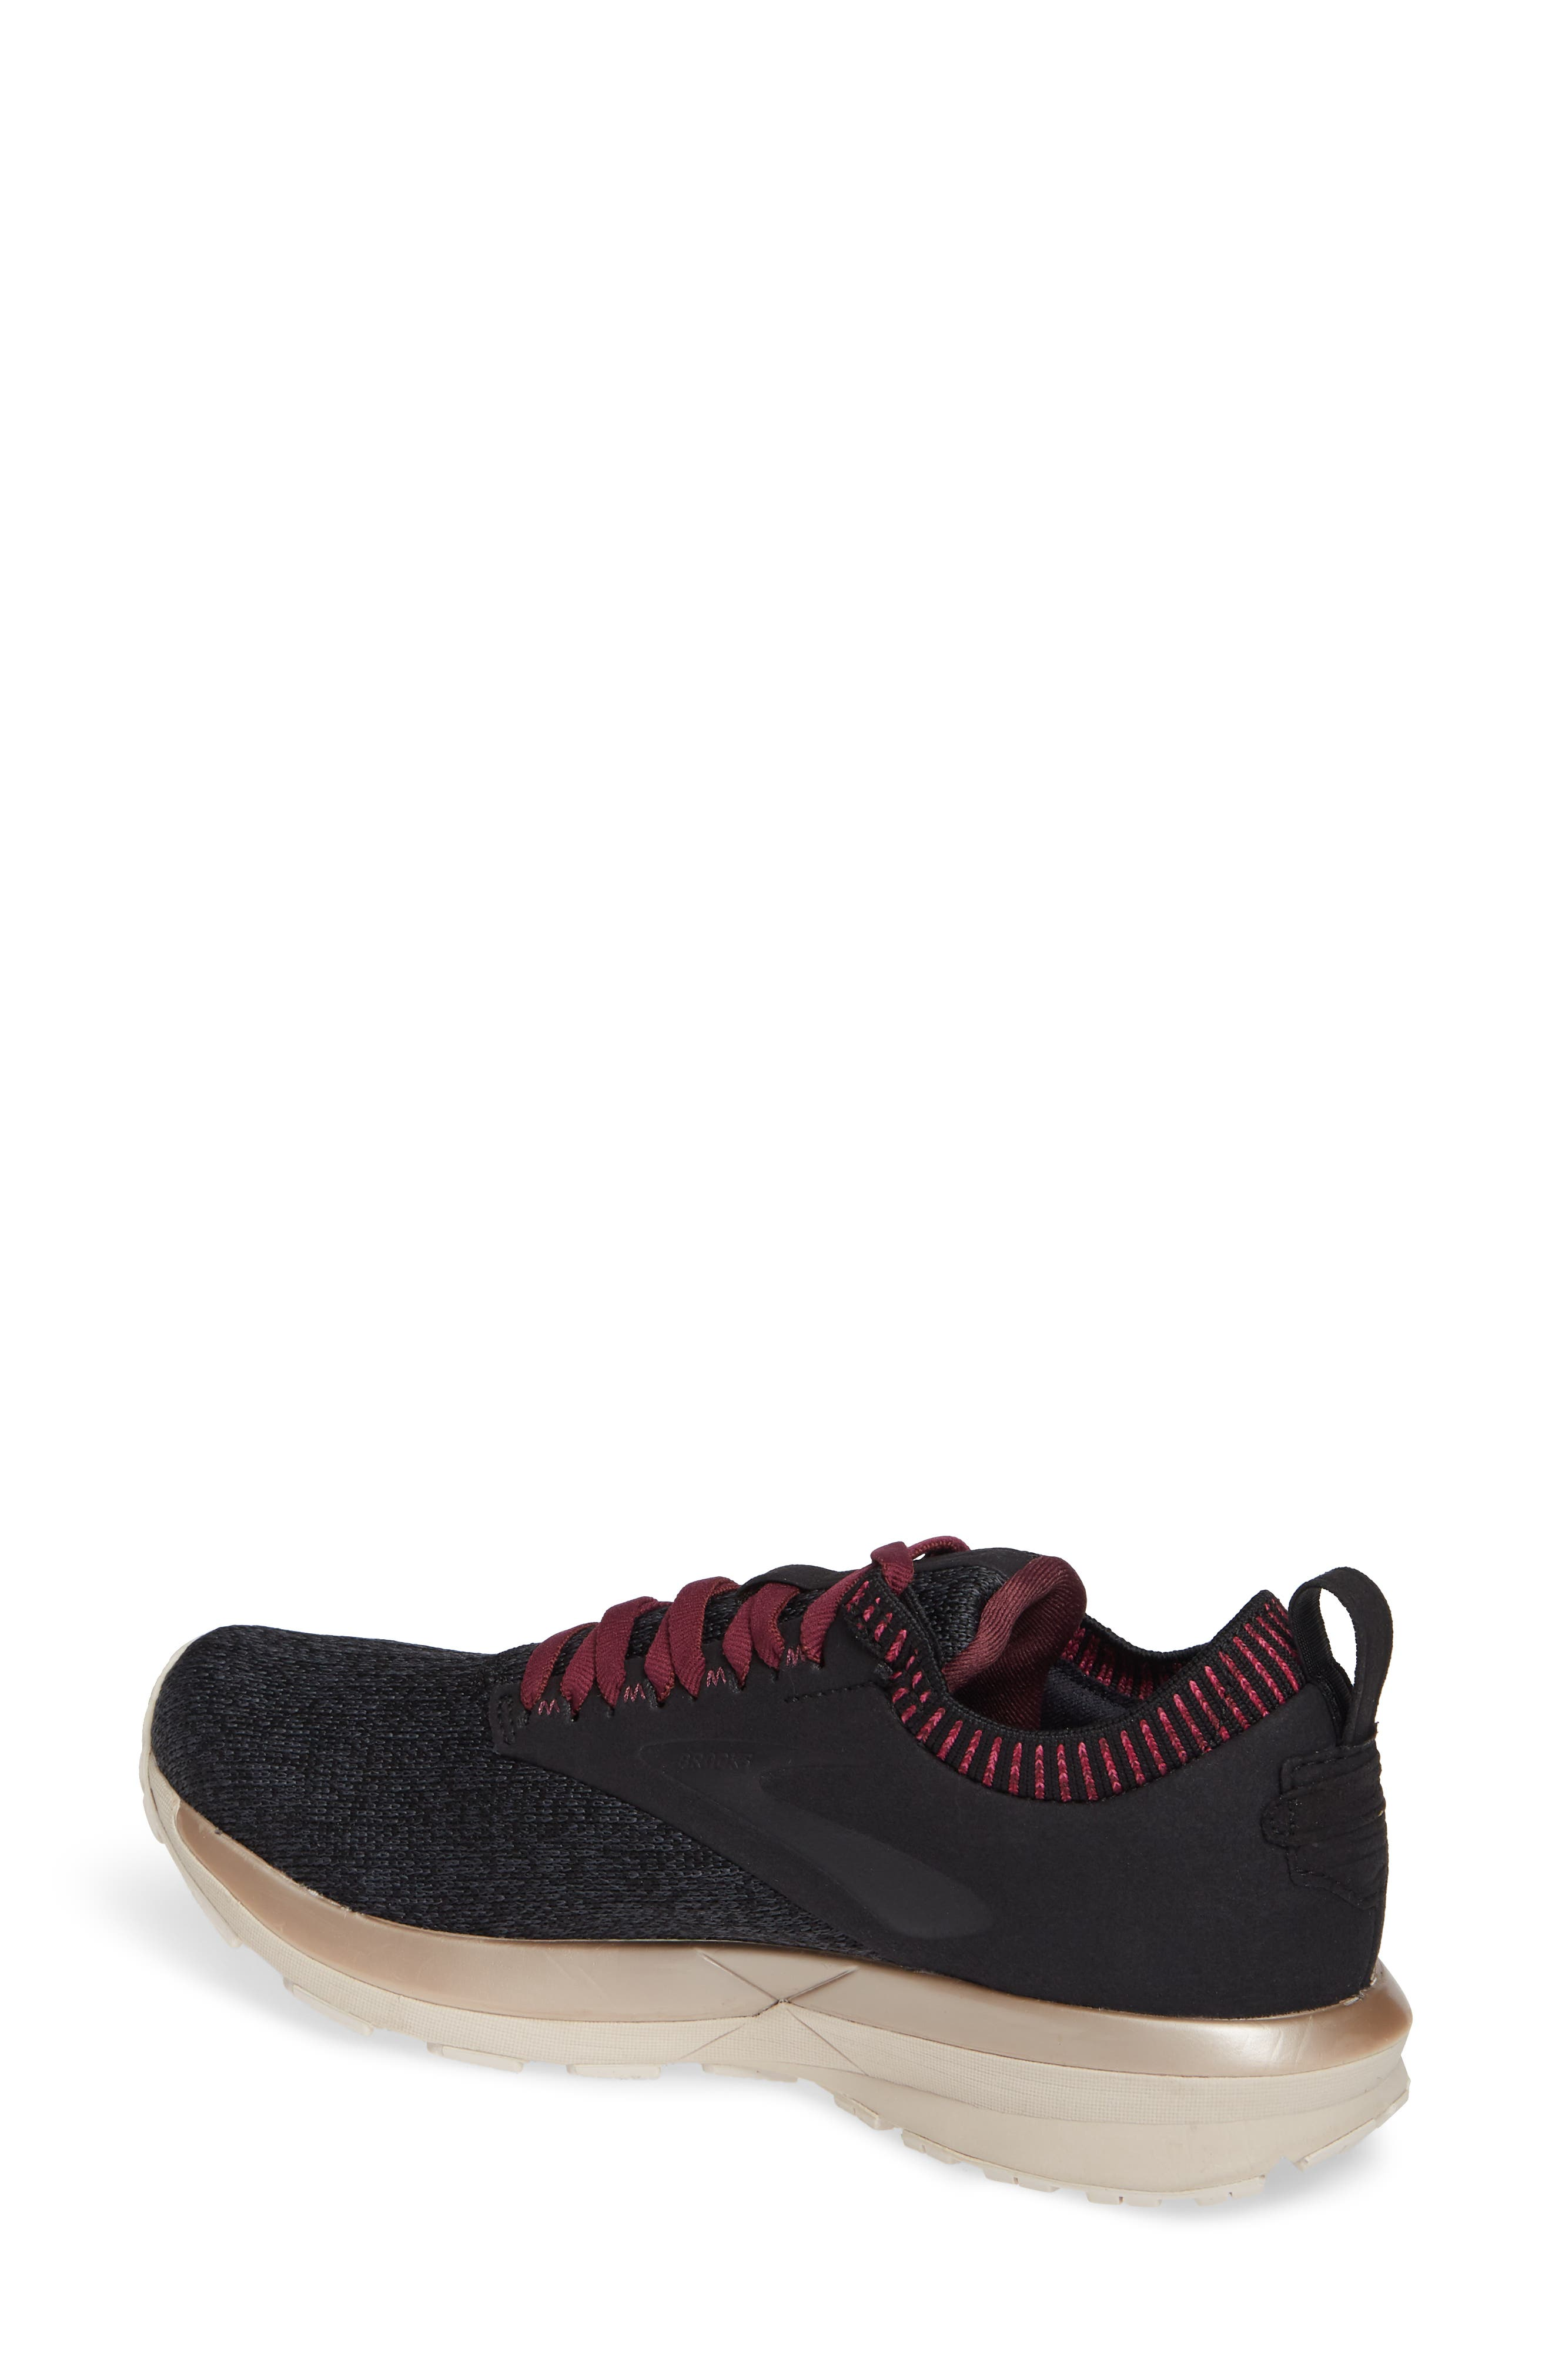 Ricochet LE Running Shoe,                             Alternate thumbnail 2, color,                             BLACK/ GREY/ PINK